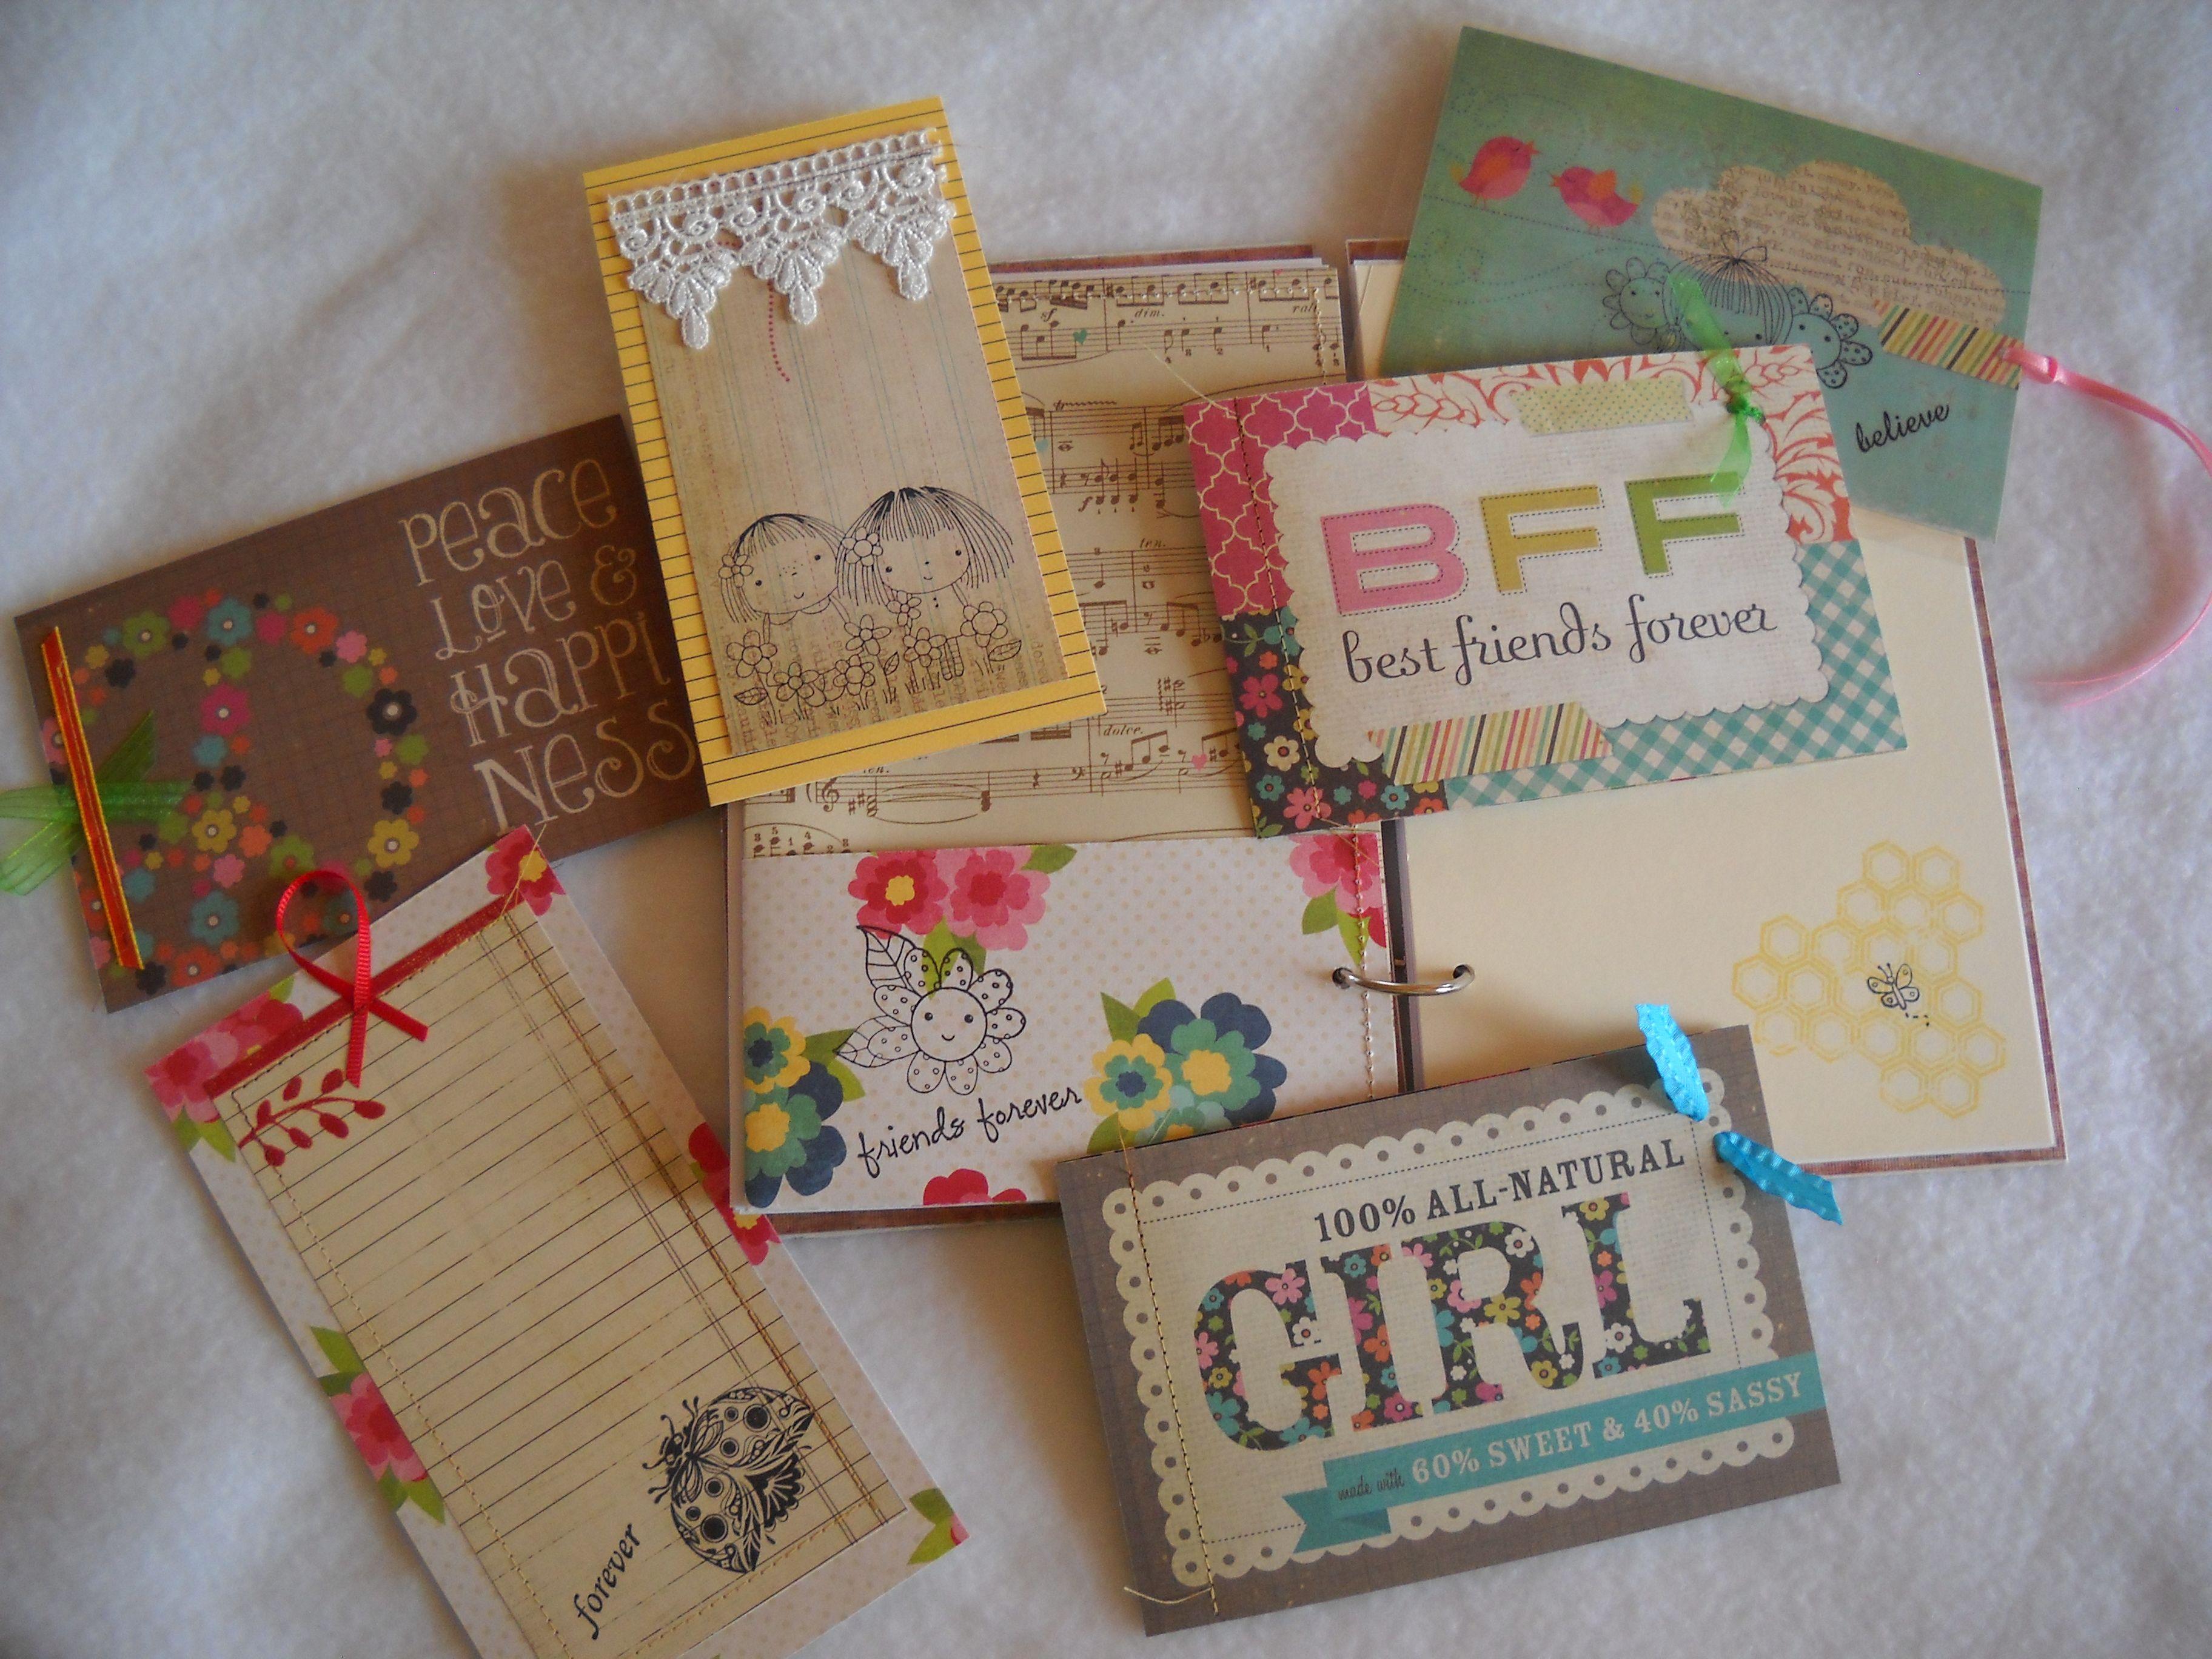 Scrapbook paper books - Handmade Journal Paper Goods Drawing Writing Travel Sketchbook Diary Album Mini Tablets Tags Notebook Folders Book